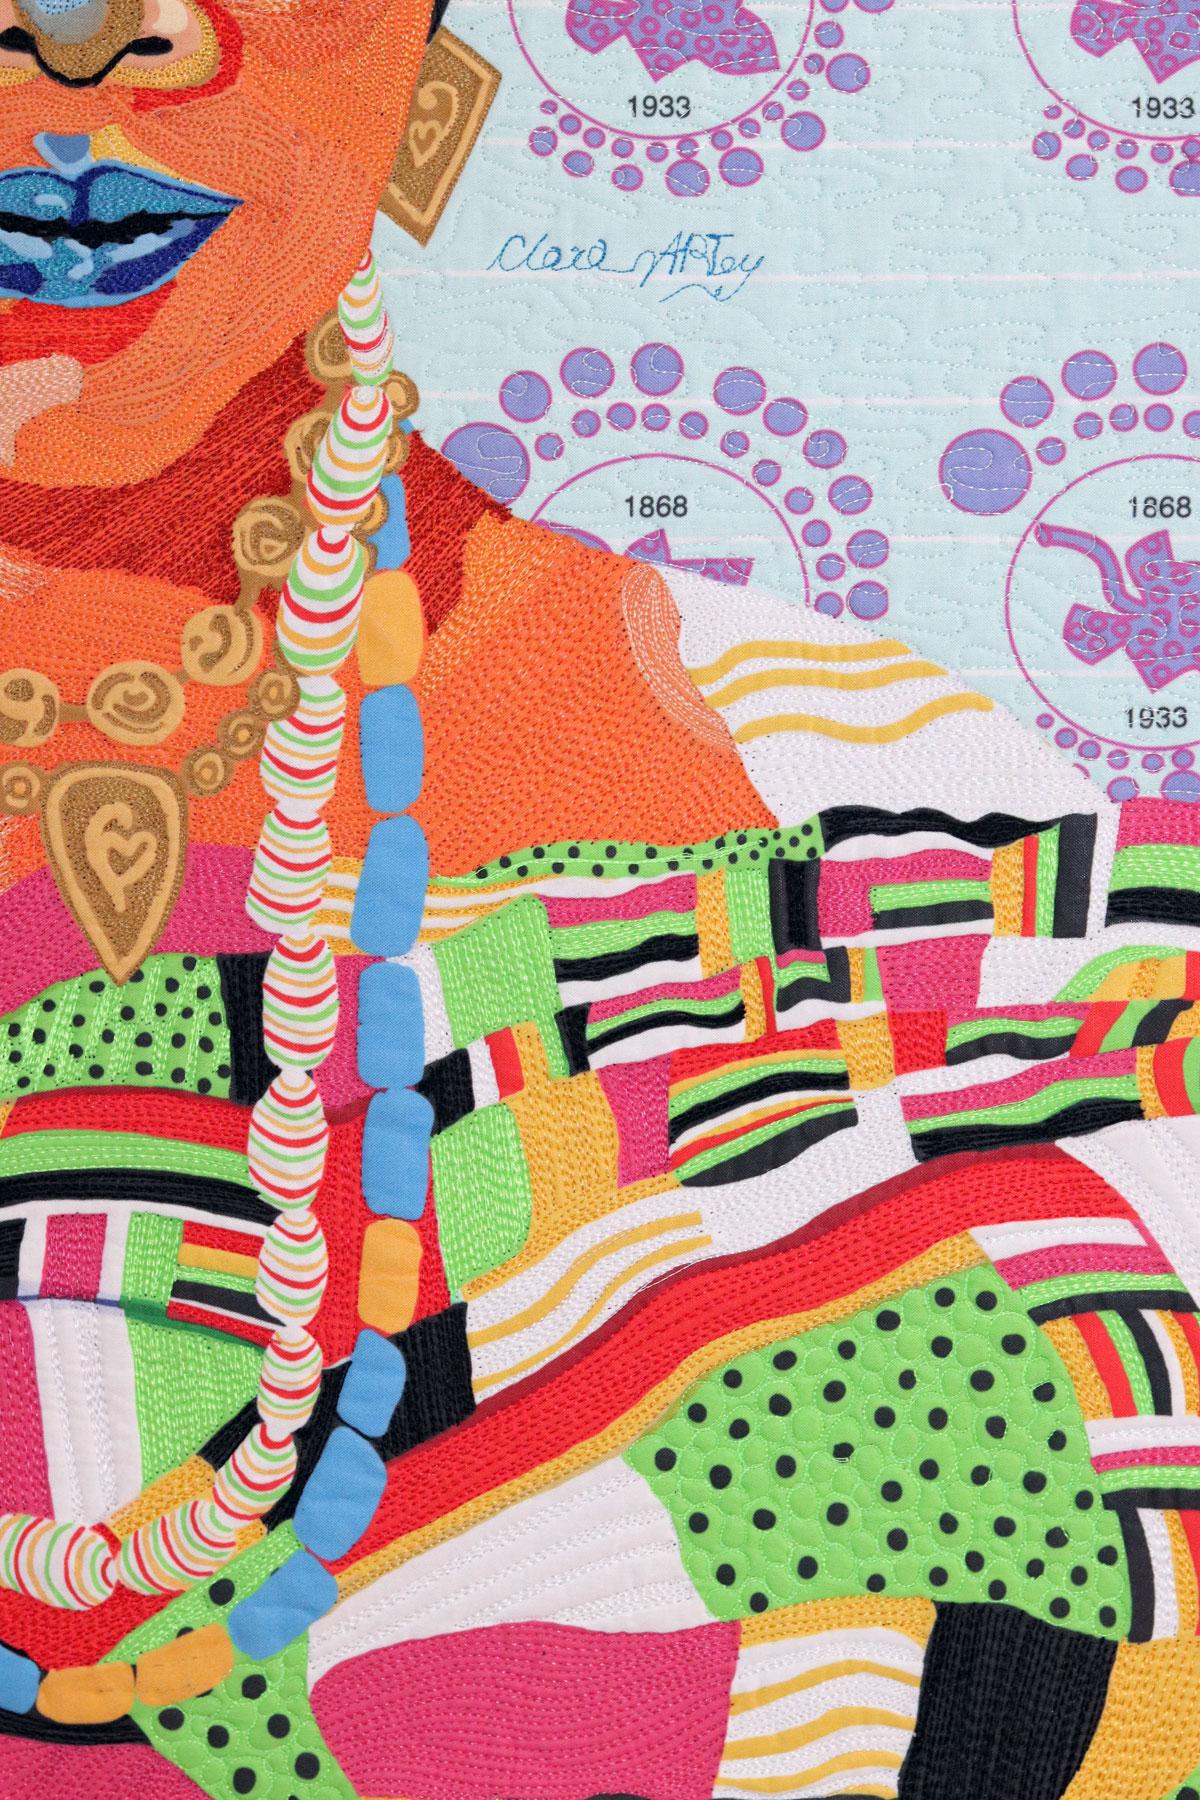 Sissieretta Jones | Fiber art| Textile Art | Thread painting | Black Patti | Matilda Jones